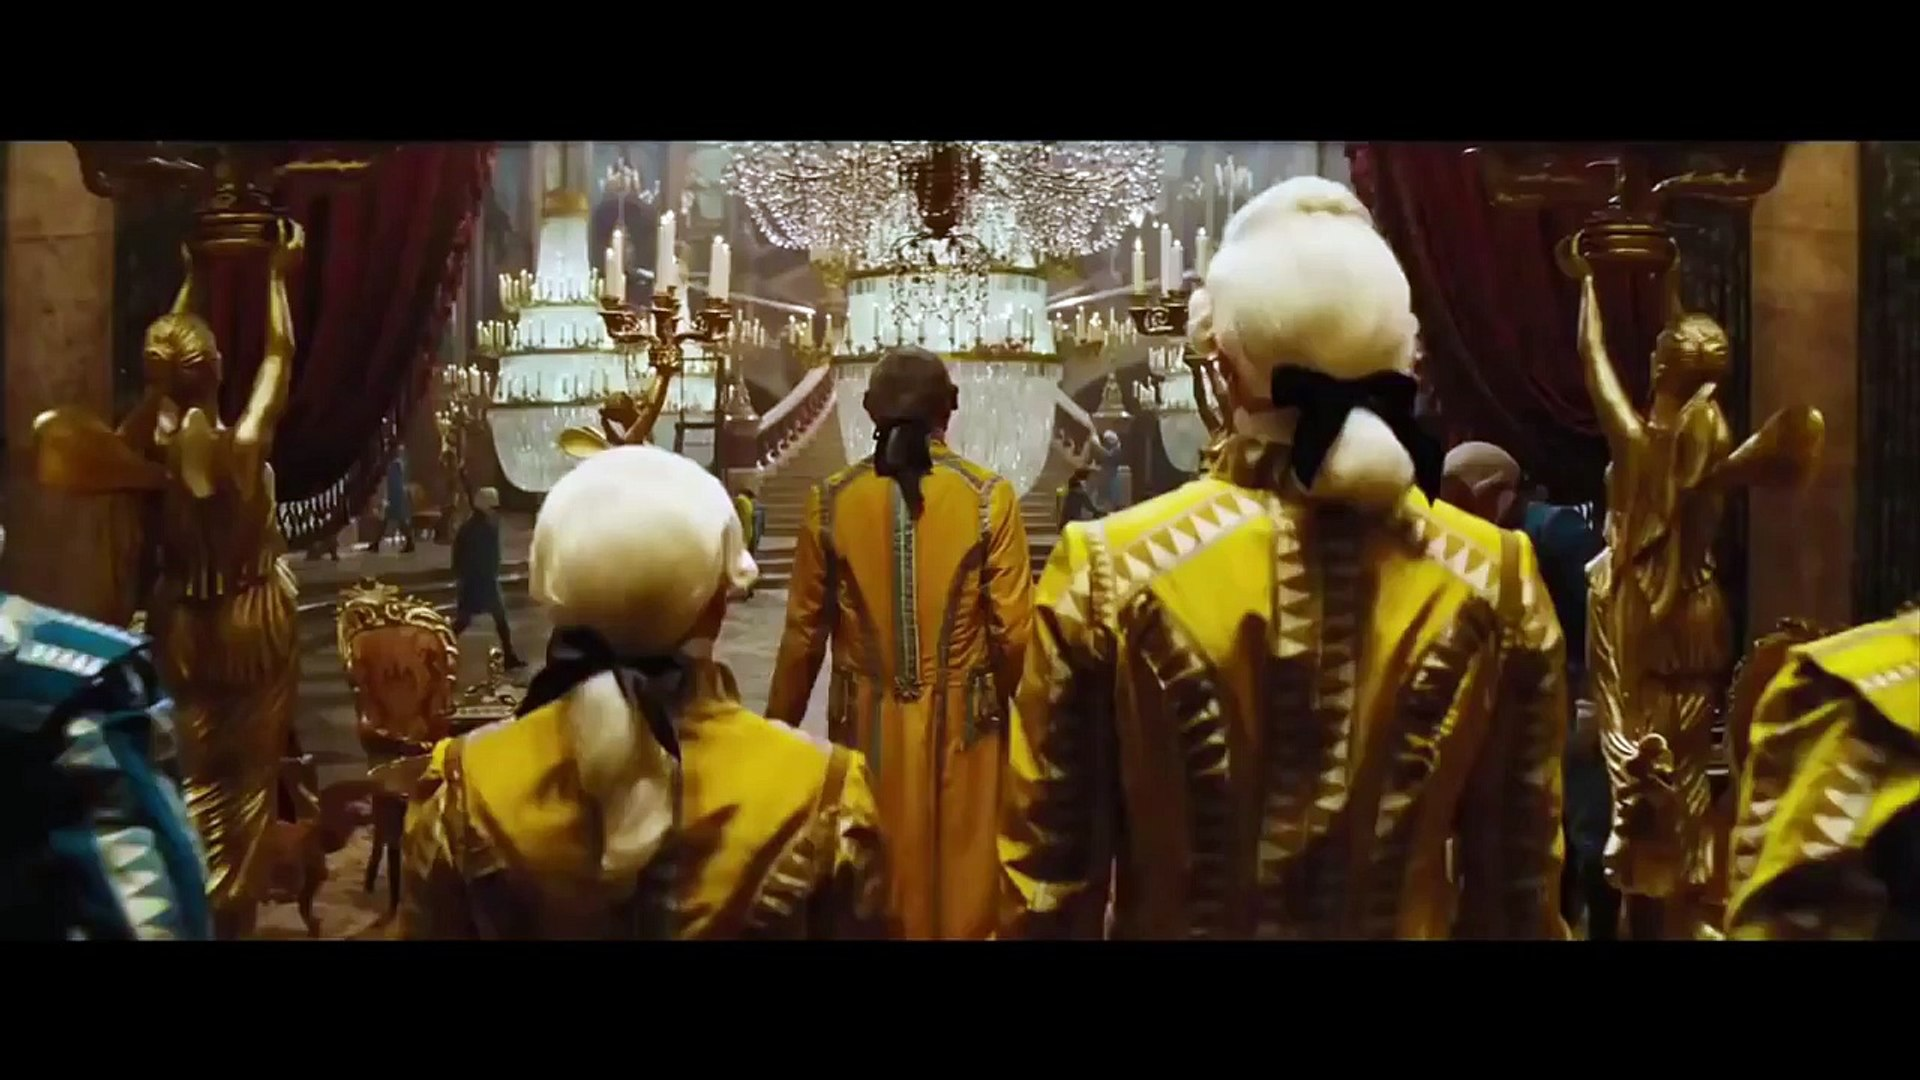 Cinderella 2015 International Trailer + Trailer Review : Beyond The Trailer